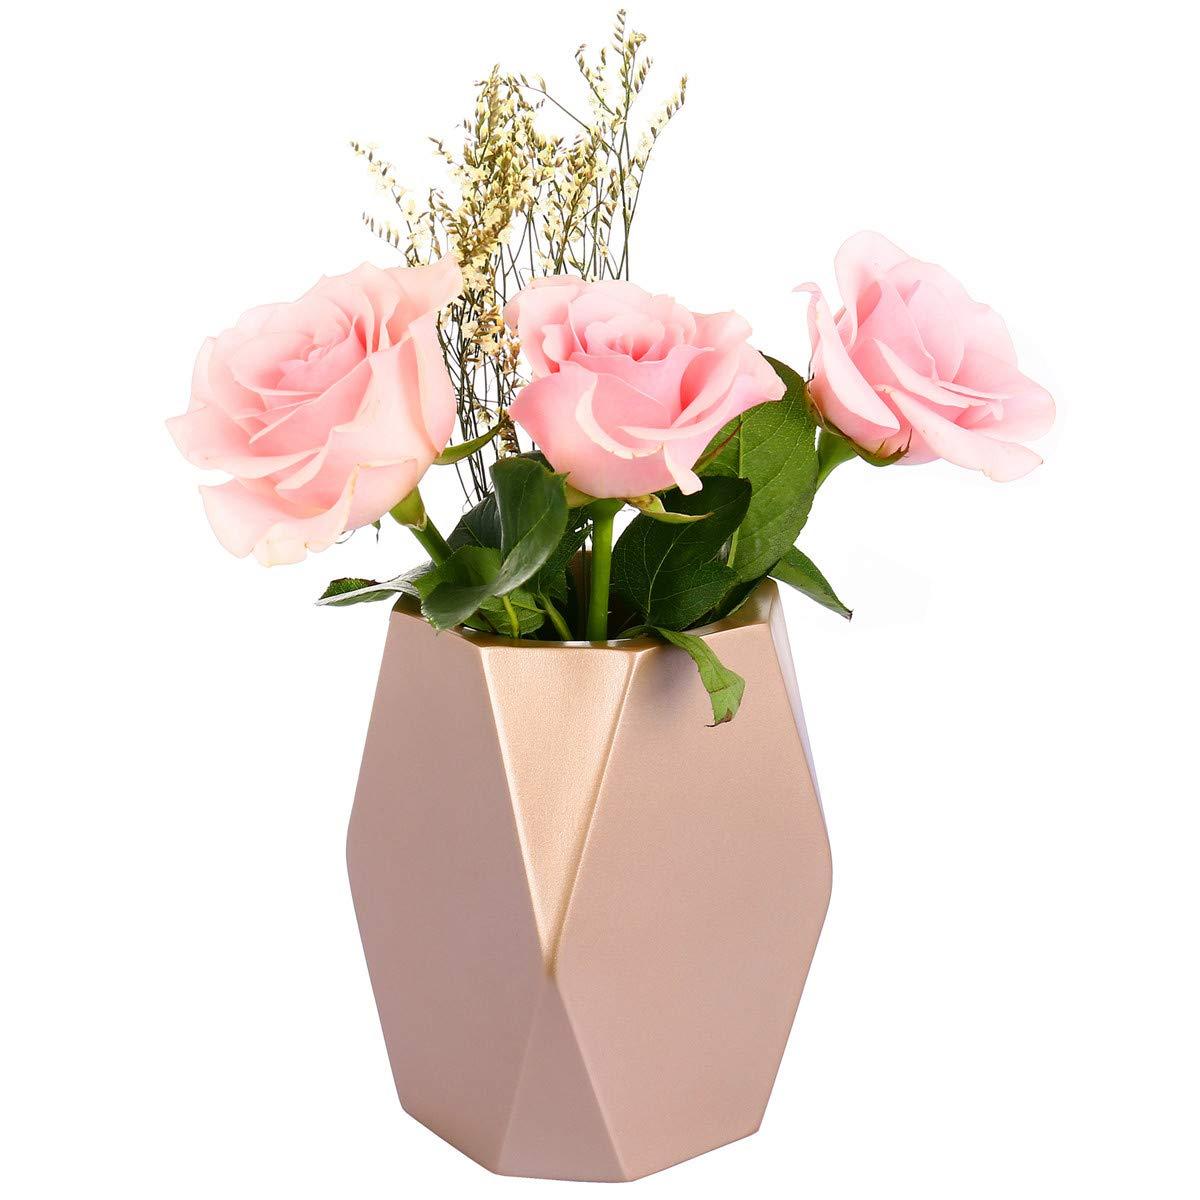 225 & Vase for Flowers Gold Vase Flower Vase Decor Decorative Vase Centerpieces Modern Vase Rose Vase Golden Vase Home Decor Geometric Vase for ...